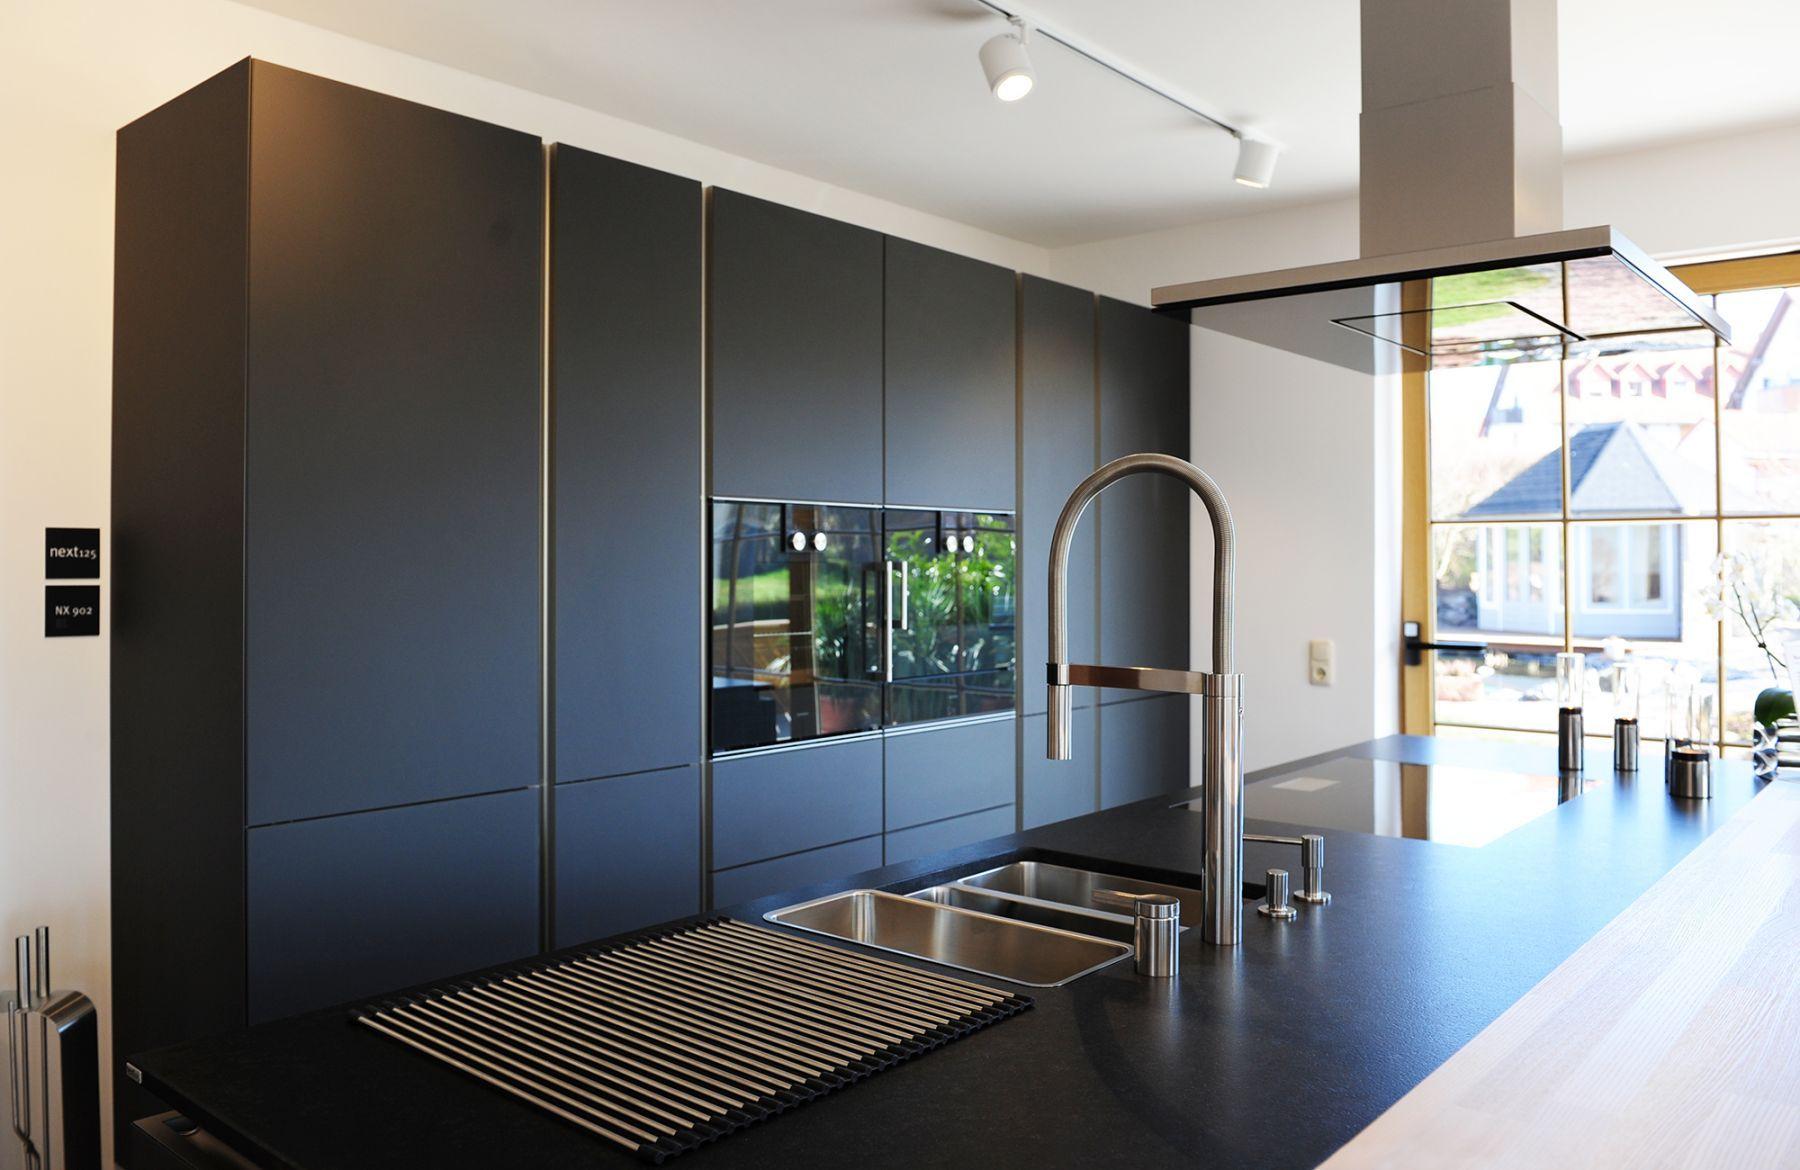 Schüller Küchen Next 19  olegoff.com  Diseño de interiores